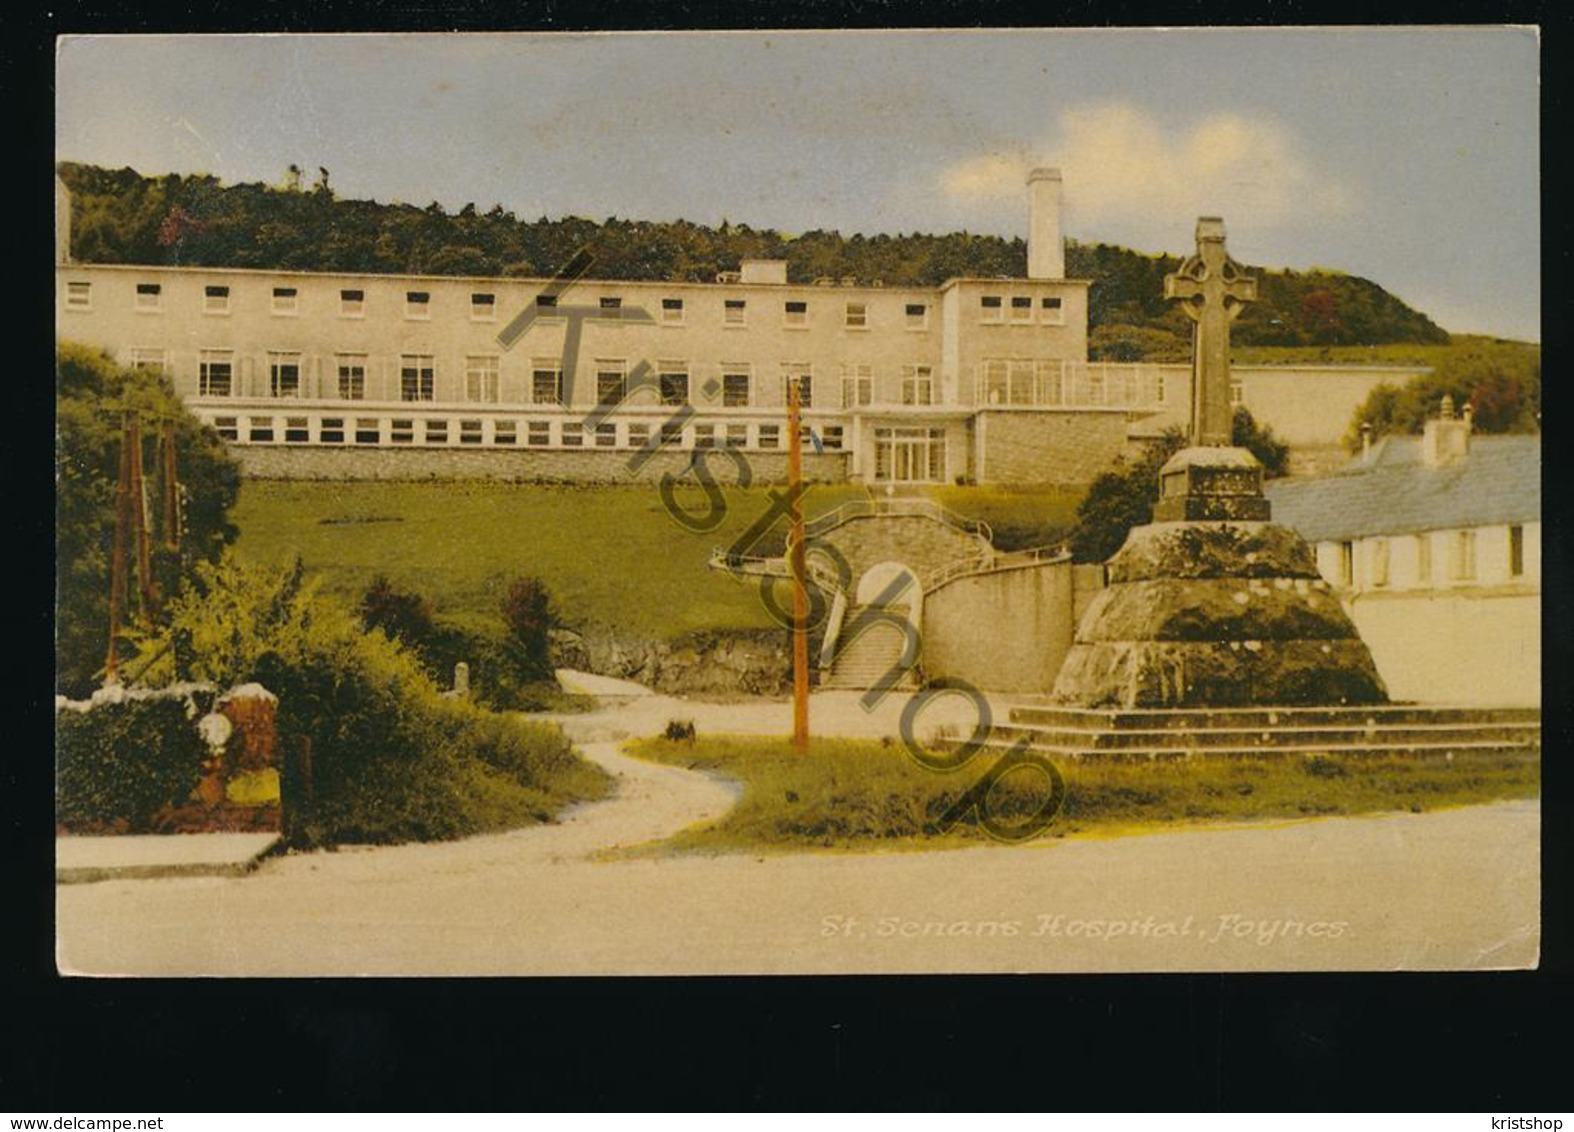 Foynes - St. Senans Hospital [AA44 3.793 - Ver. Königreich